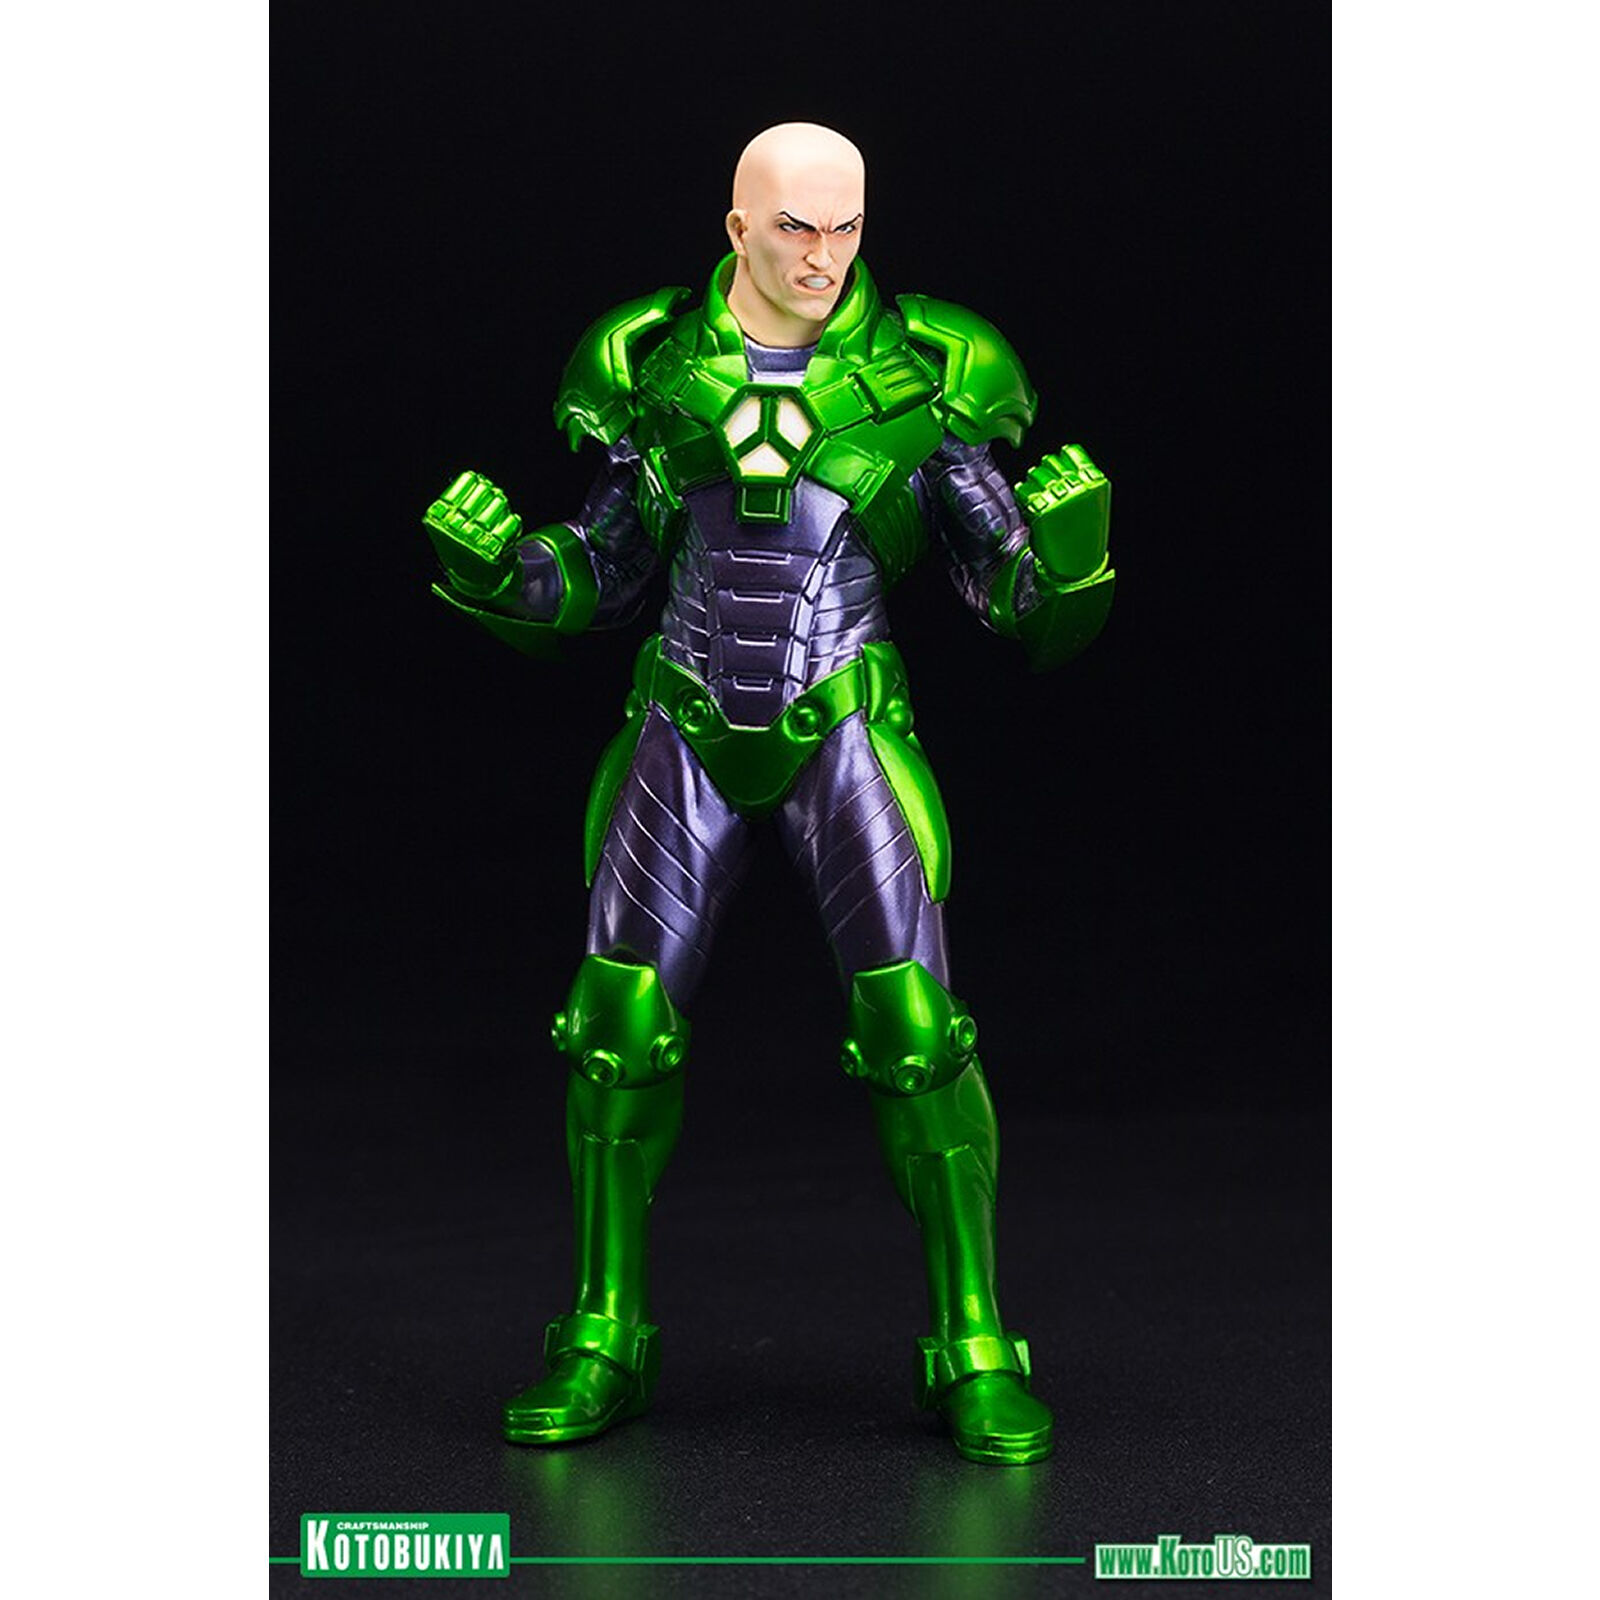 Kotobukiya - DC COMICS Lex Luthor